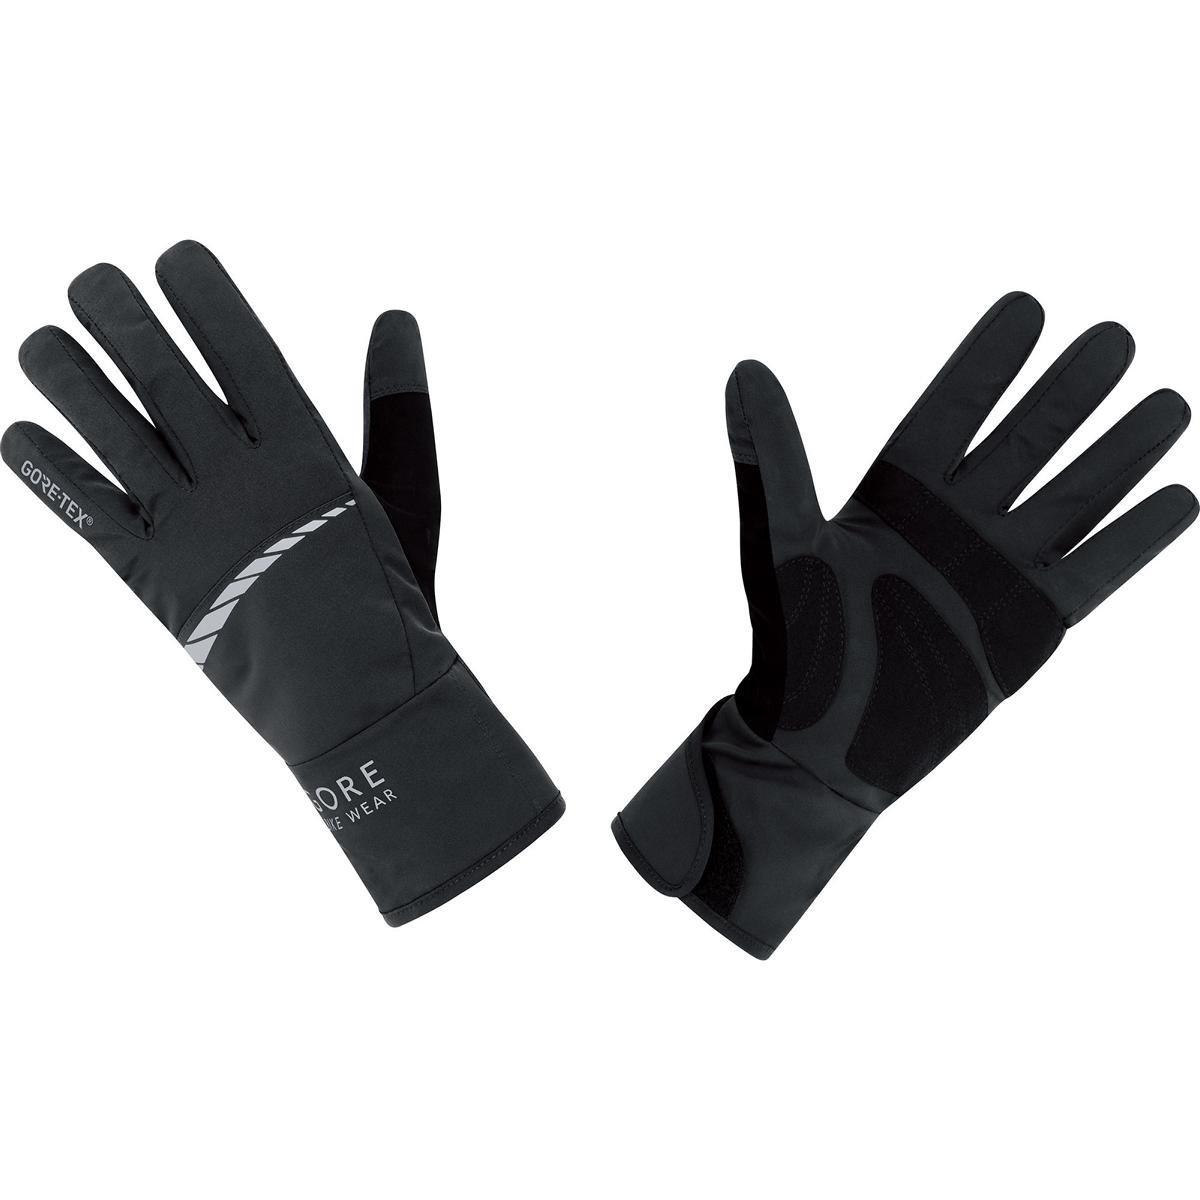 Gore Bike Wear Men's Road Cycling Gore-Tex Gloves